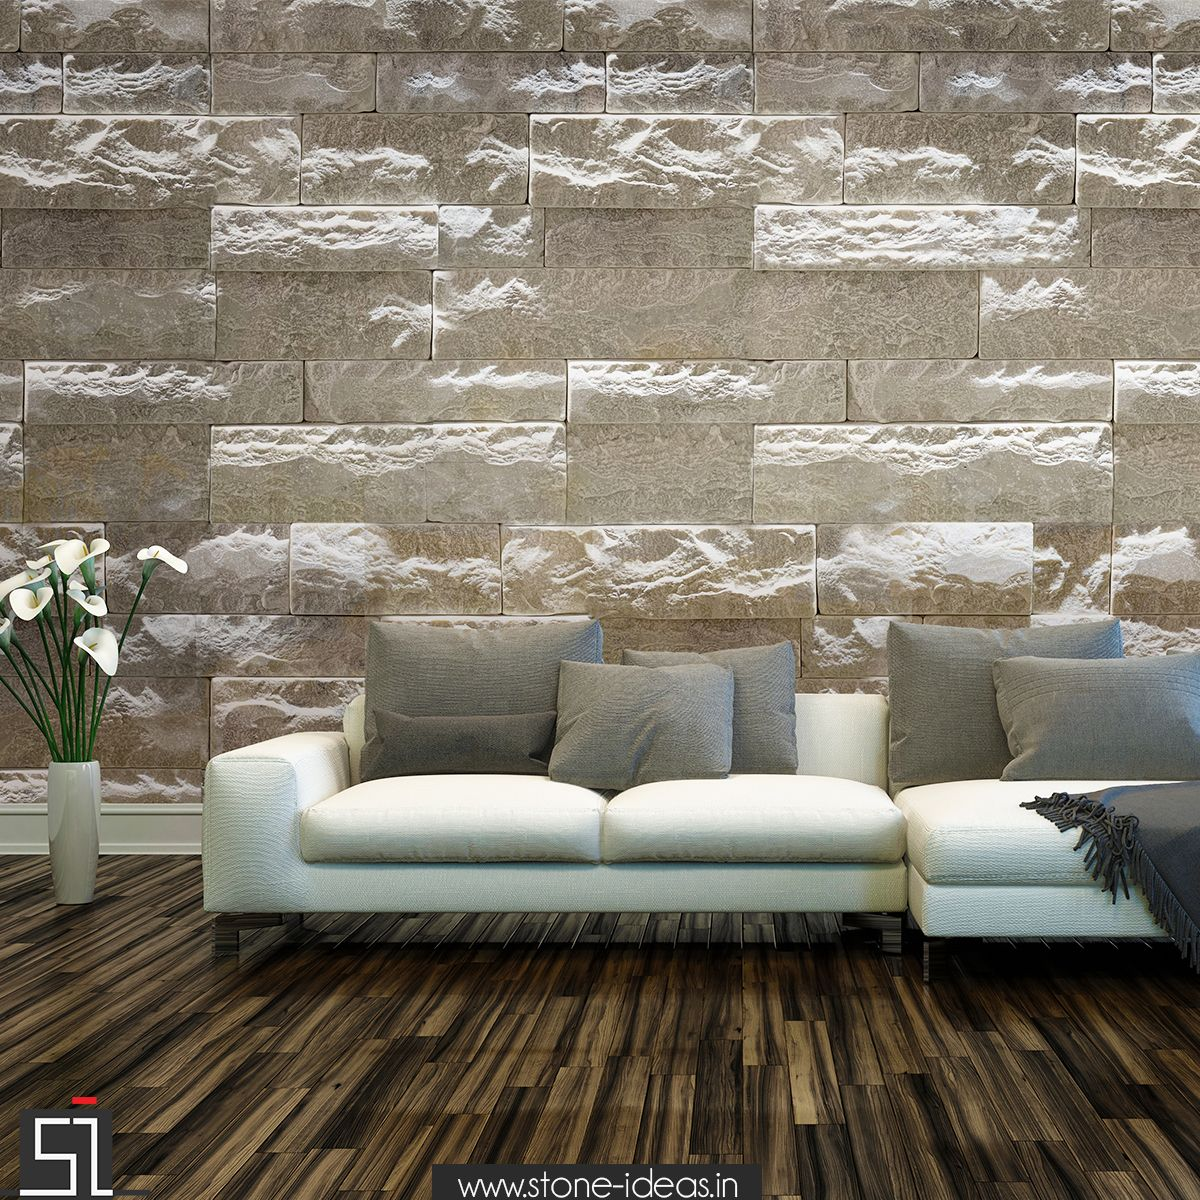 White Marble Stone Cladding Stone Cladding Interior Stone Wall Cladding Wall Tiles Design